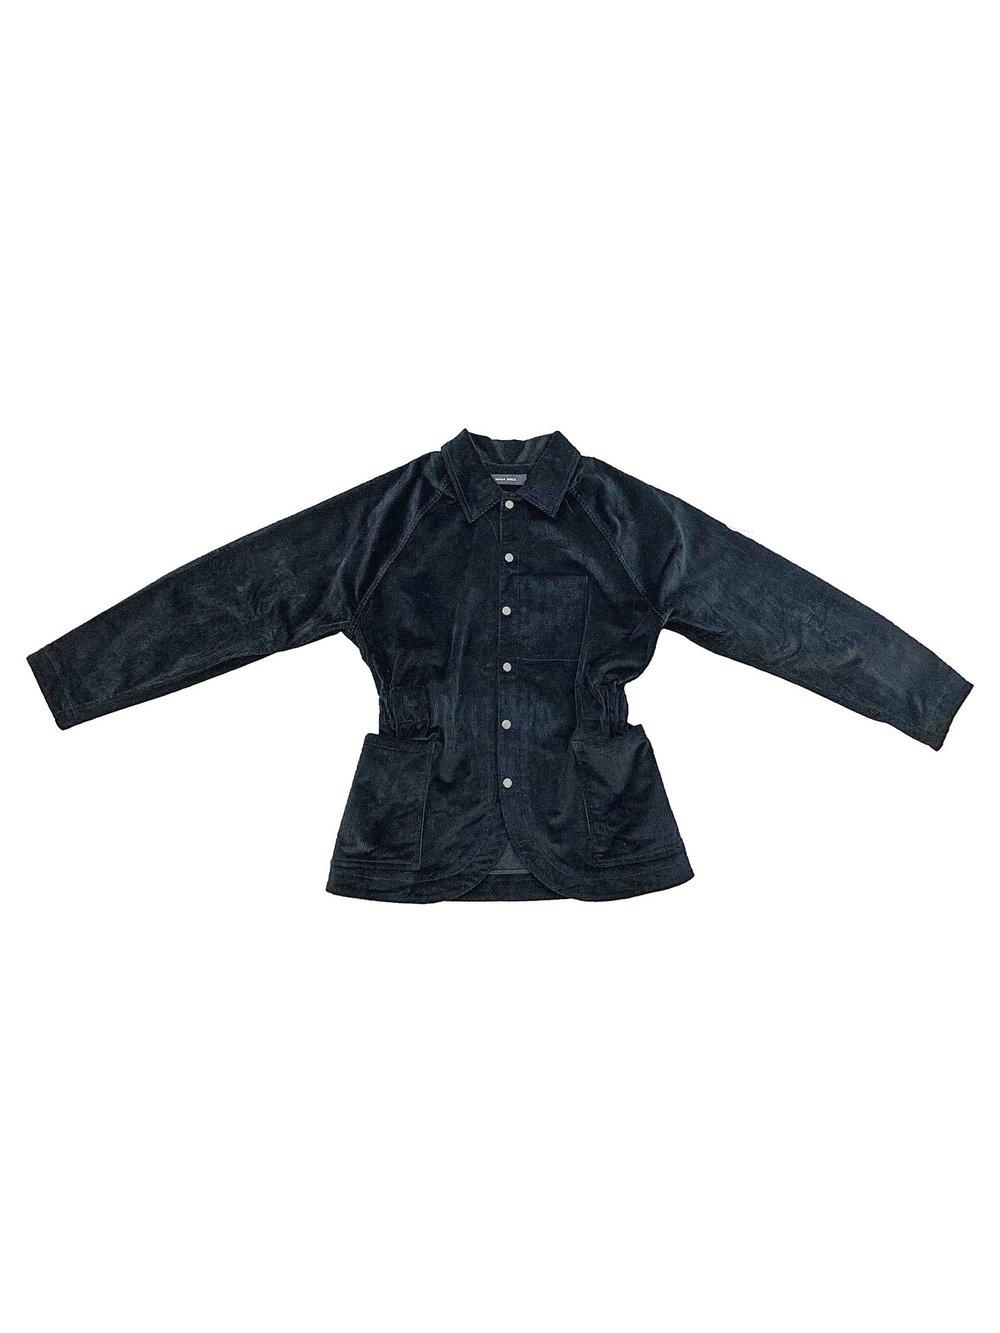 Image of Maja Brix & Aarstiderne - Jacket - Black Corduroy